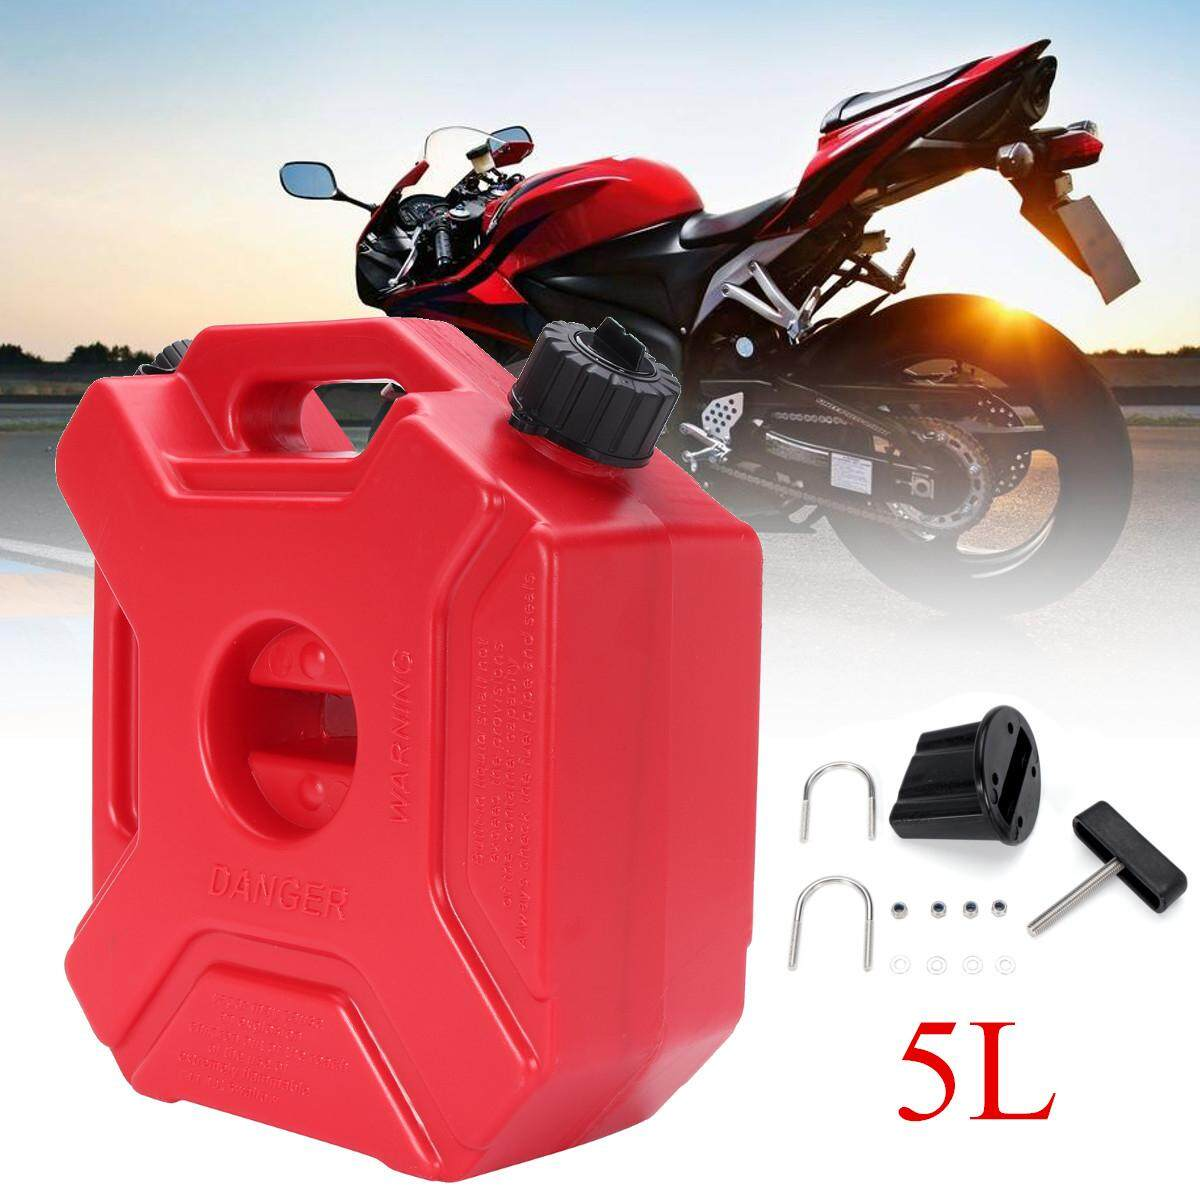 5L ถังแบบพกพาถังน้ำมันสำรองพลาสติกวาล์วแก็สดีเซลล็อค ATV SUV รถจักรยานยนต์